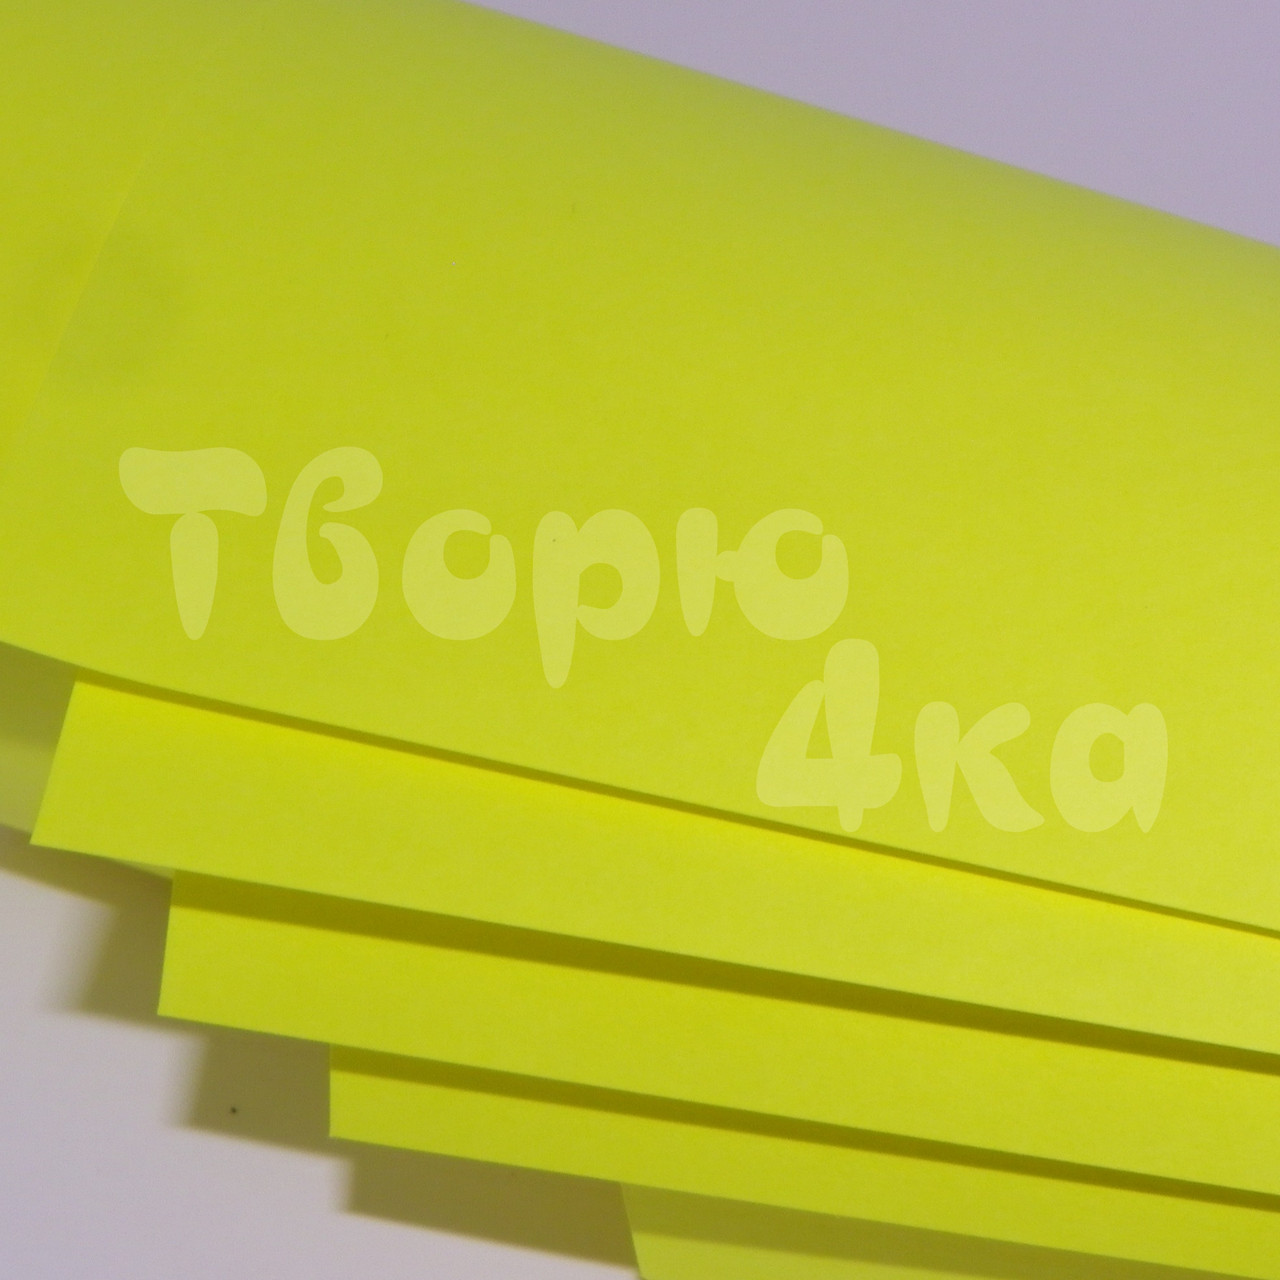 Бумага цветная А3 160 гр/м.кв cyber yellow (кислотный желтый)